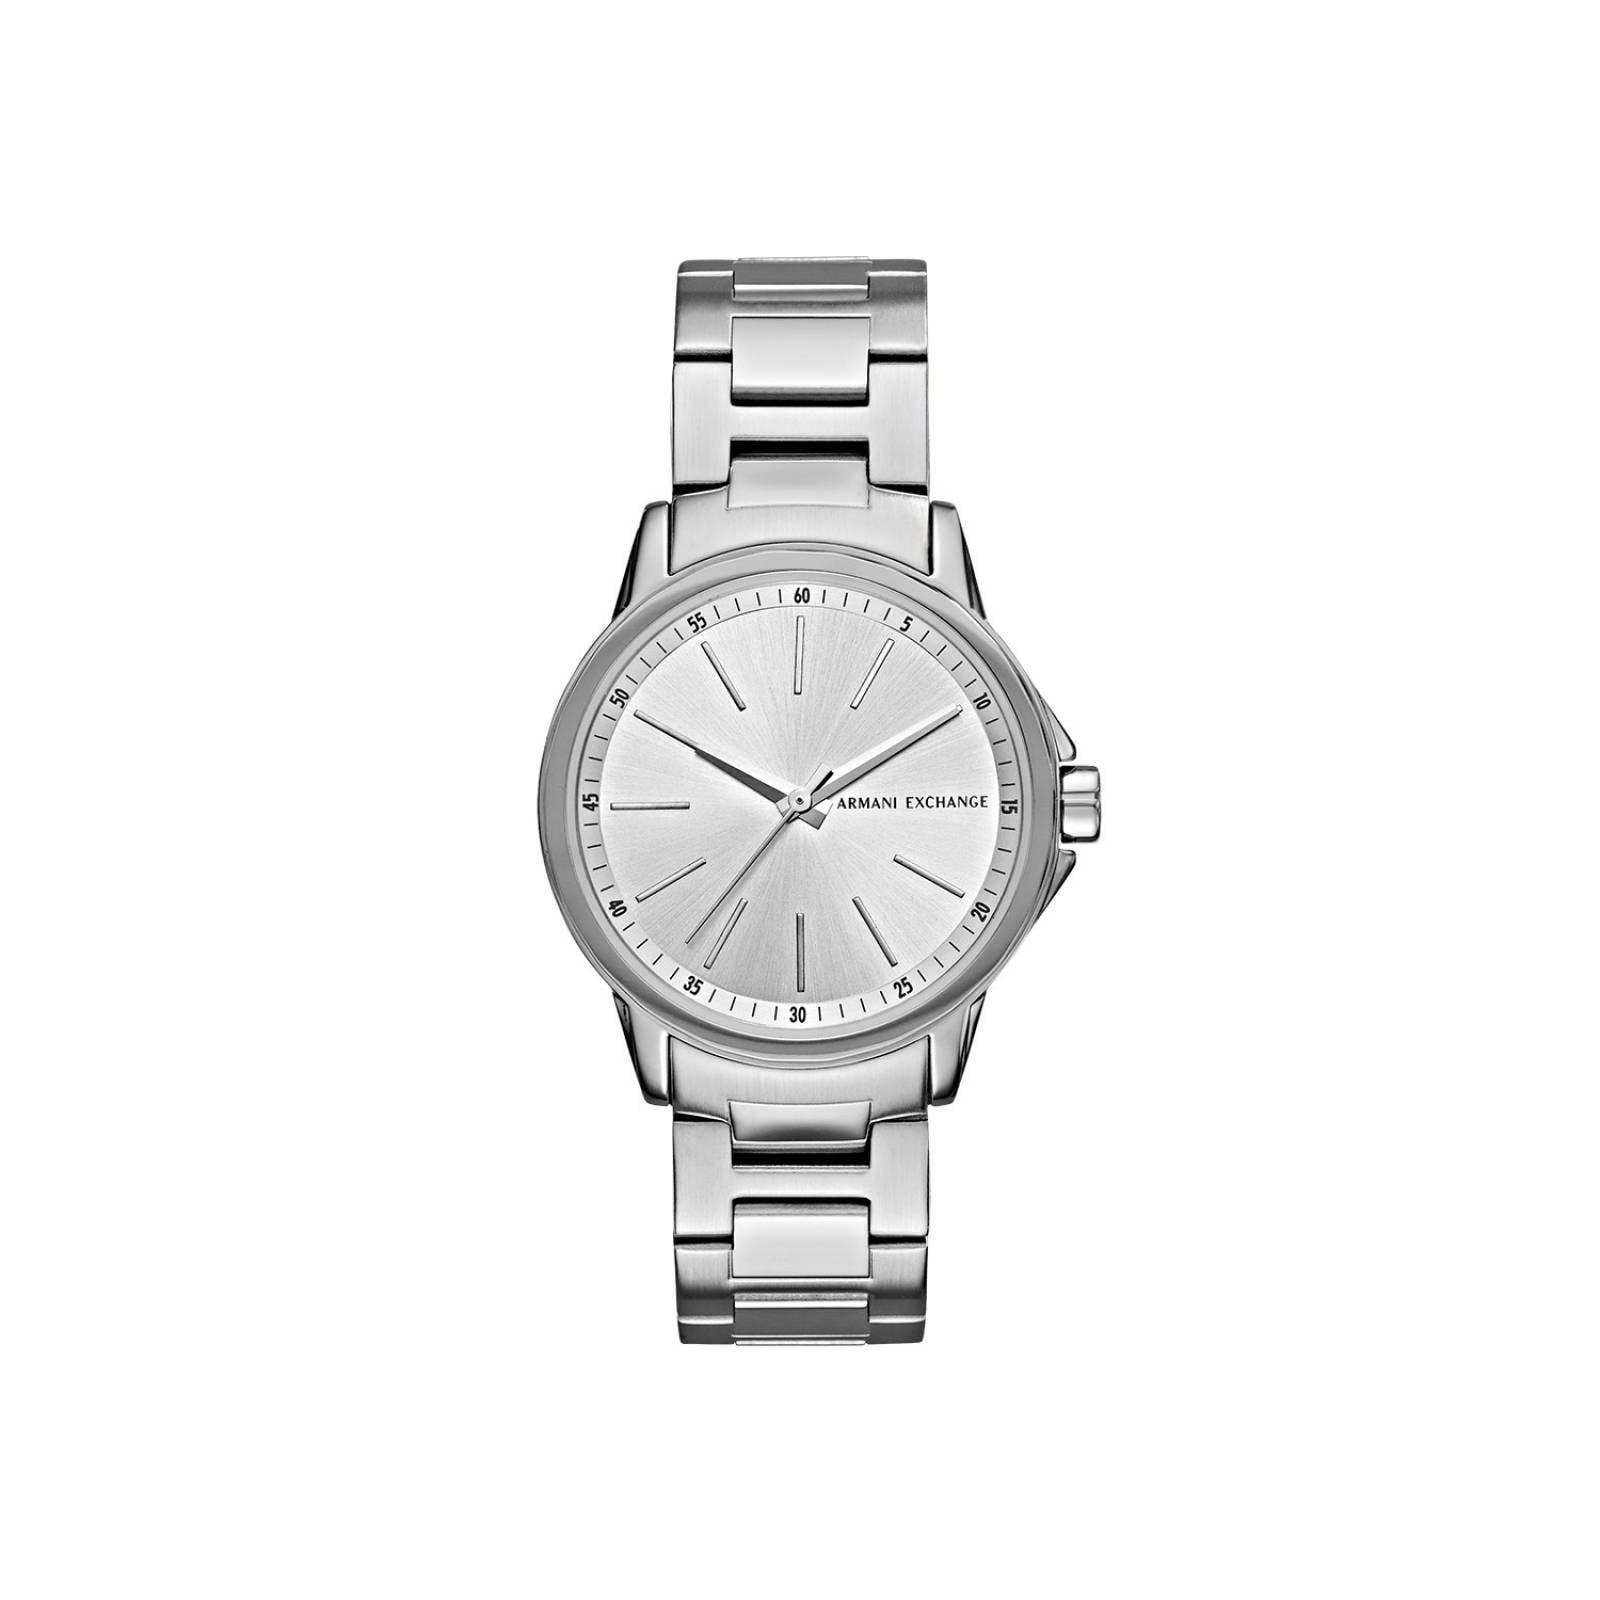 4d000a489dba Reloj armani exchange smart tradicional dama